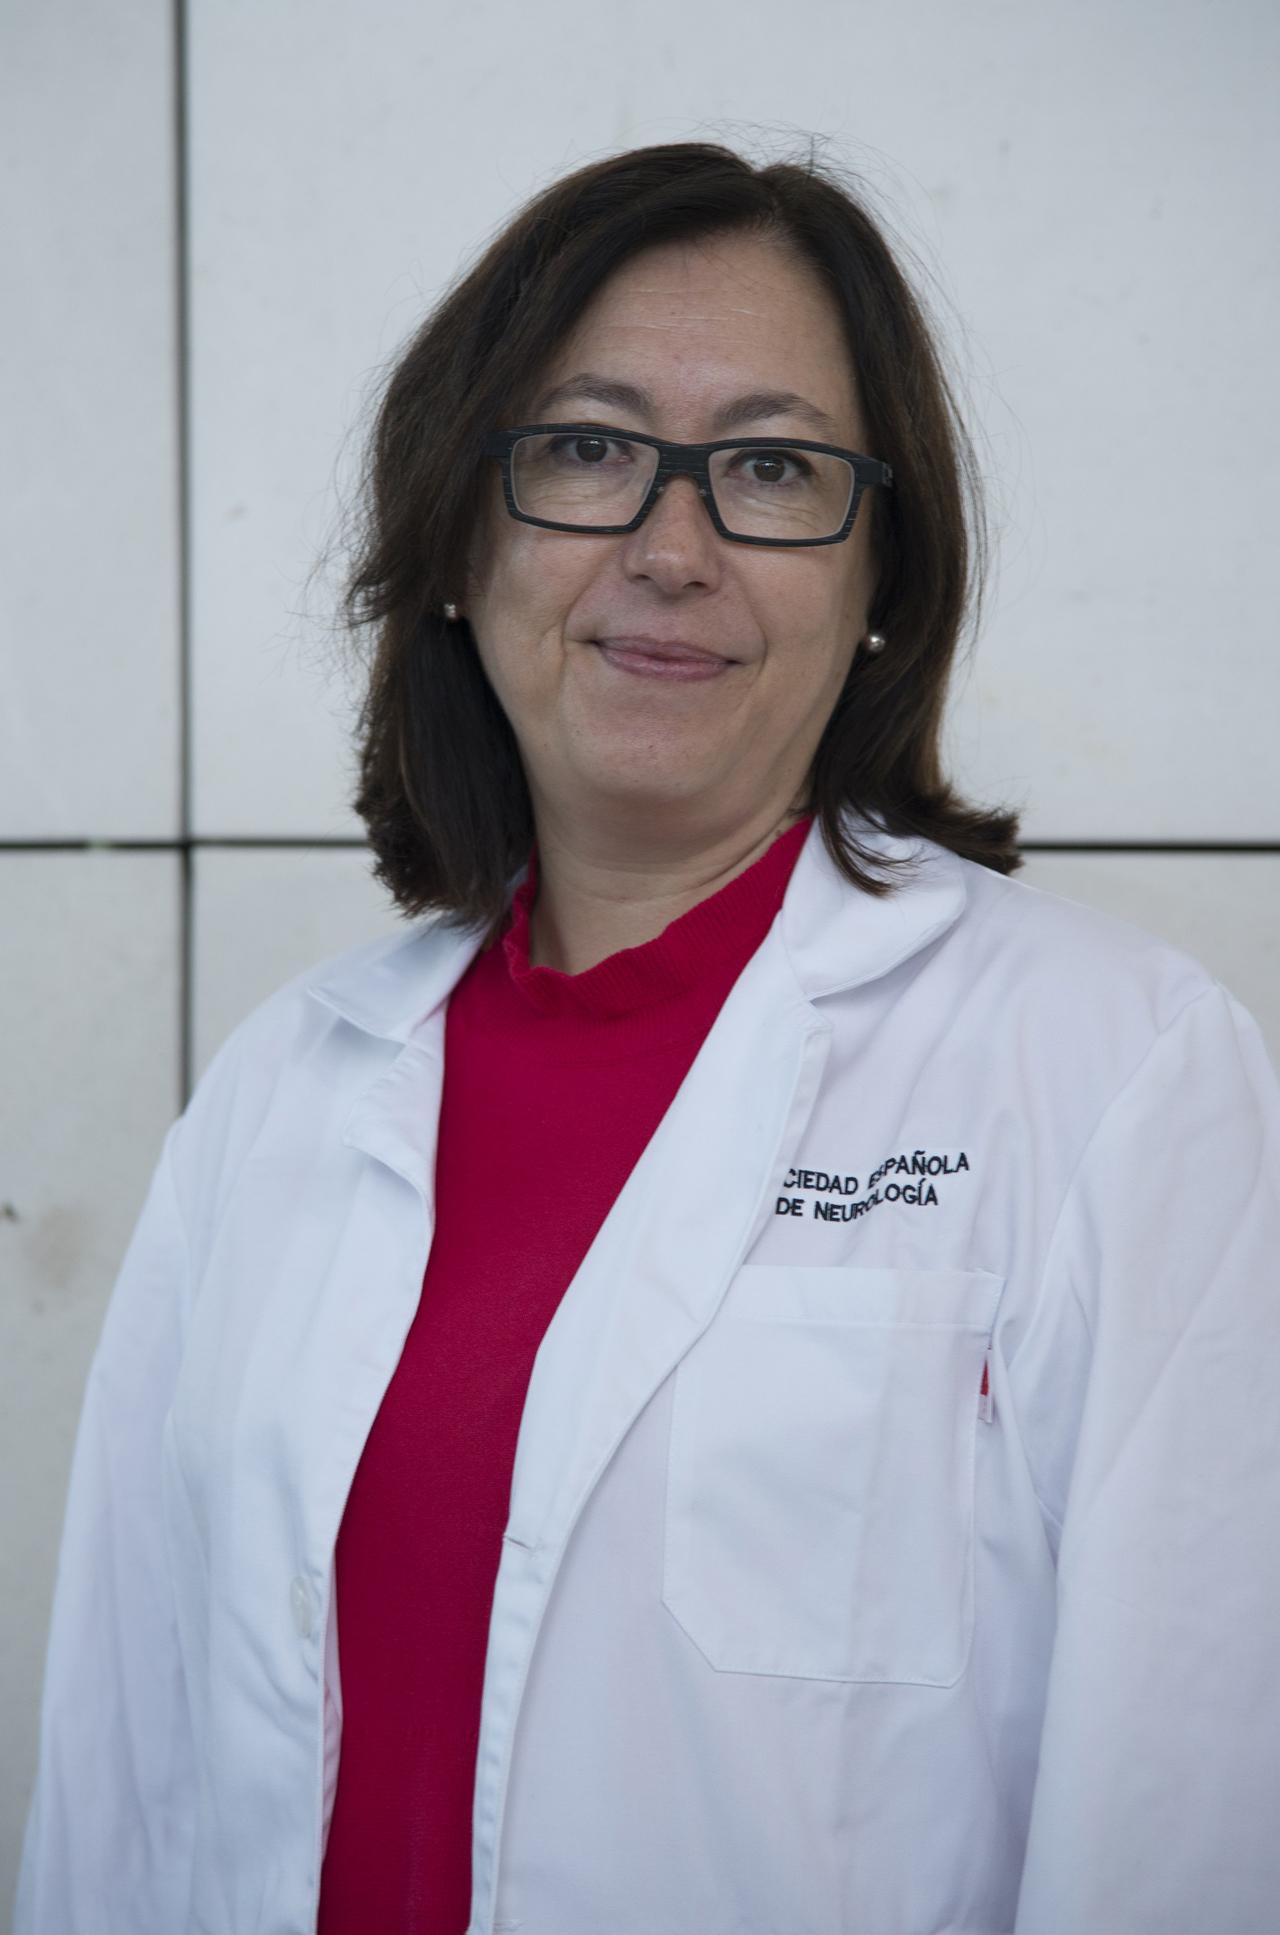 Mar�a Alonso de Leciñana, coordinadora del Grupo de Estudio de Enfermedades Cerebrovasculares de la Sociedad Española de Neurolog�a (SEN).